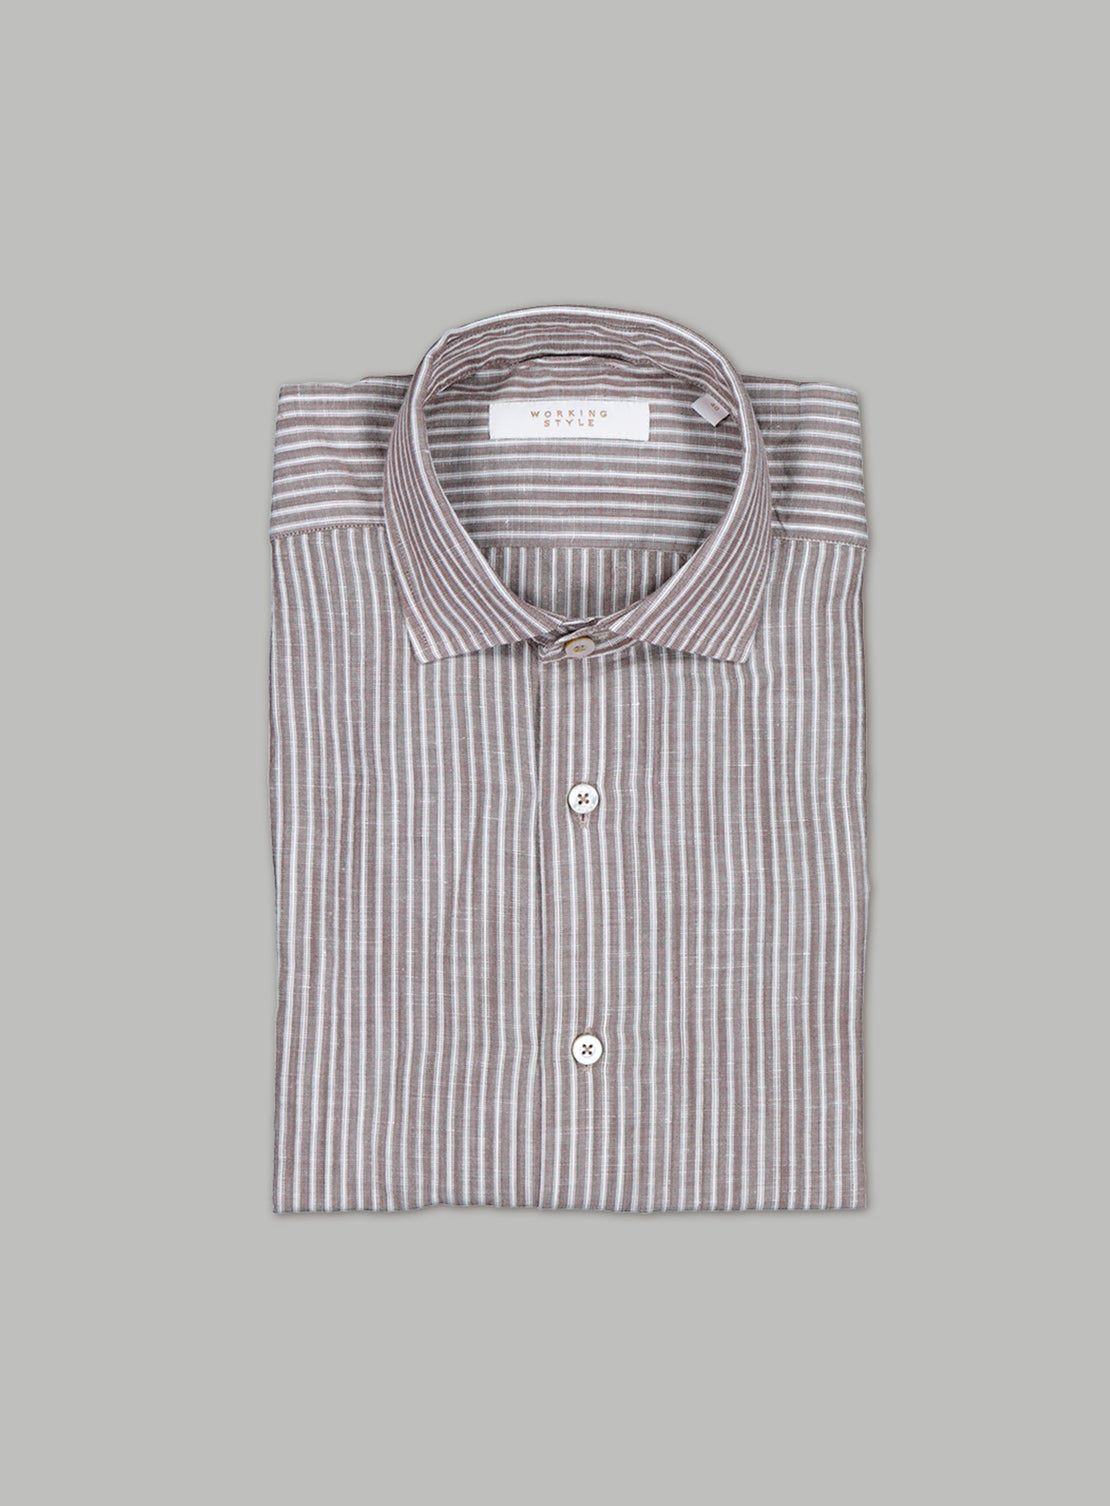 Brown & White Bordered Stripe Shirt